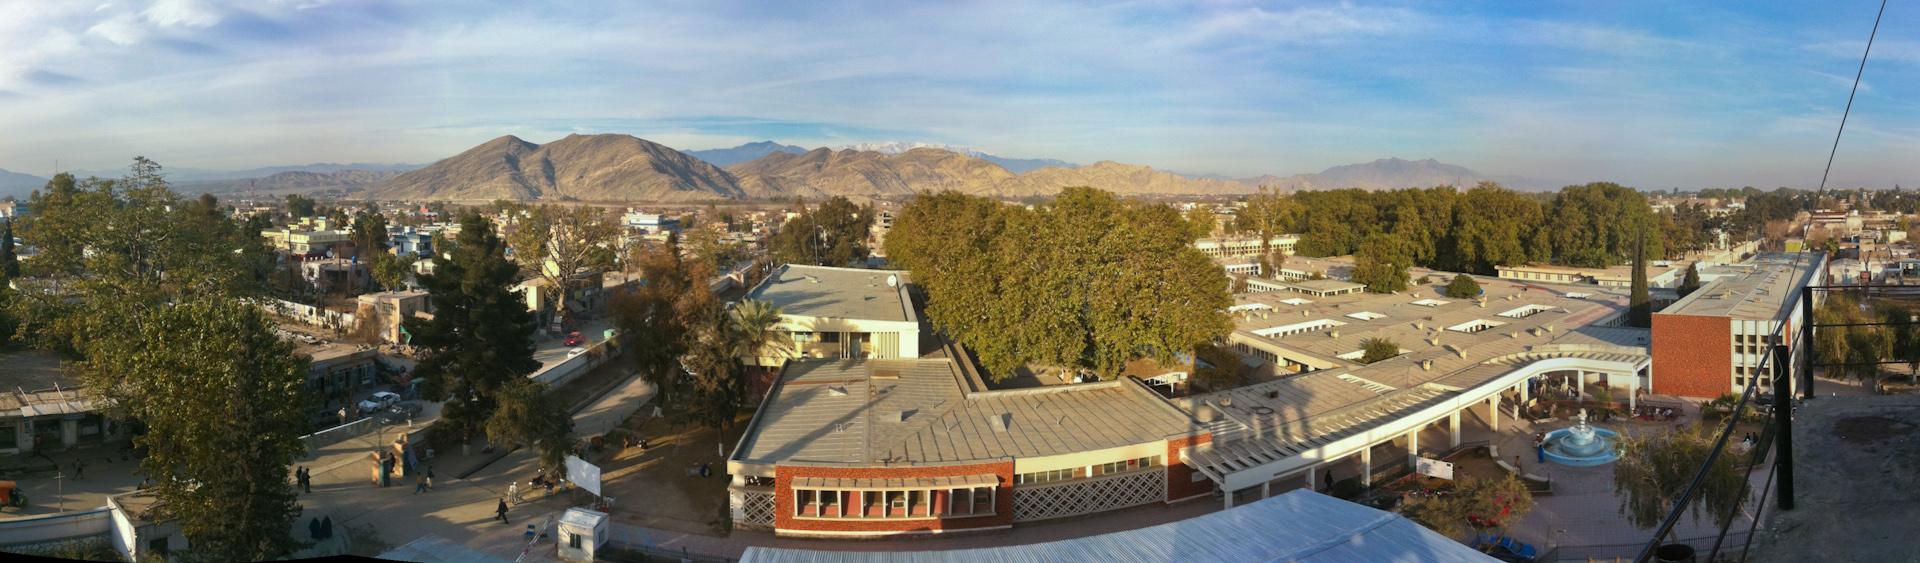 Jalalabad_in_January_2011.jpg